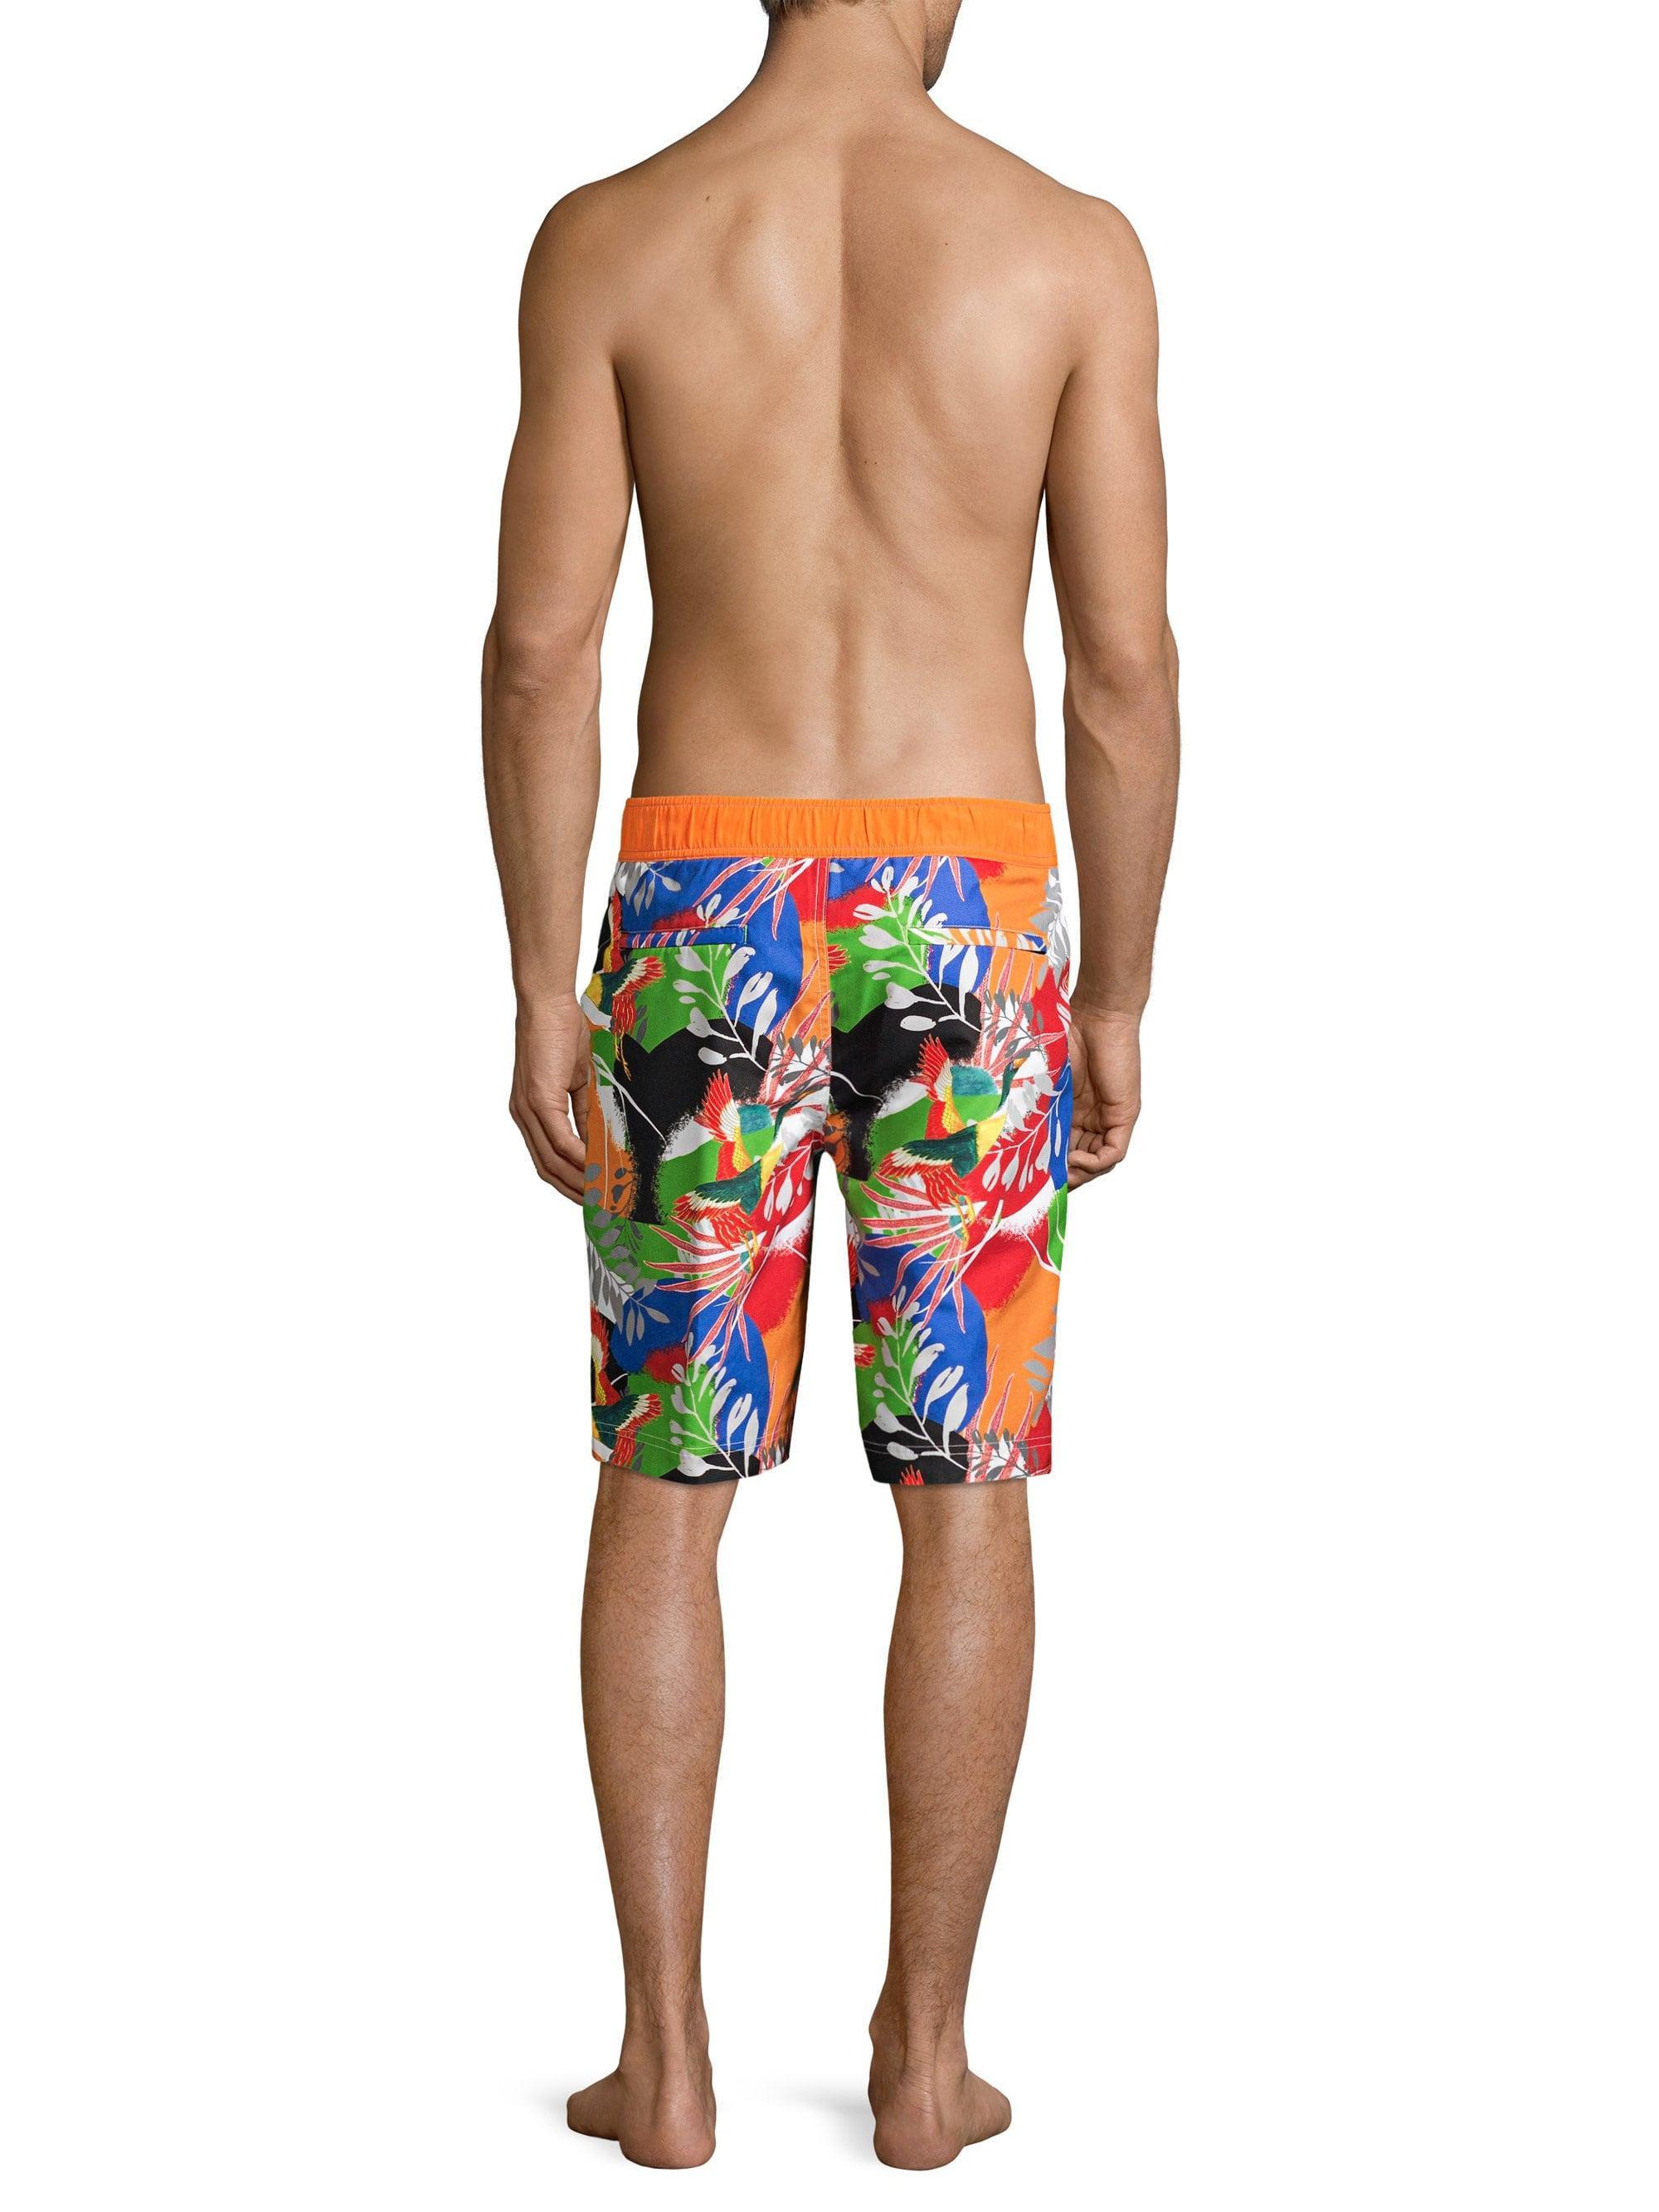 4a4c7f7de4 Lyst - Robert Graham Men's Matanazas Tropical Print Board Shorts - Size 40  for Men